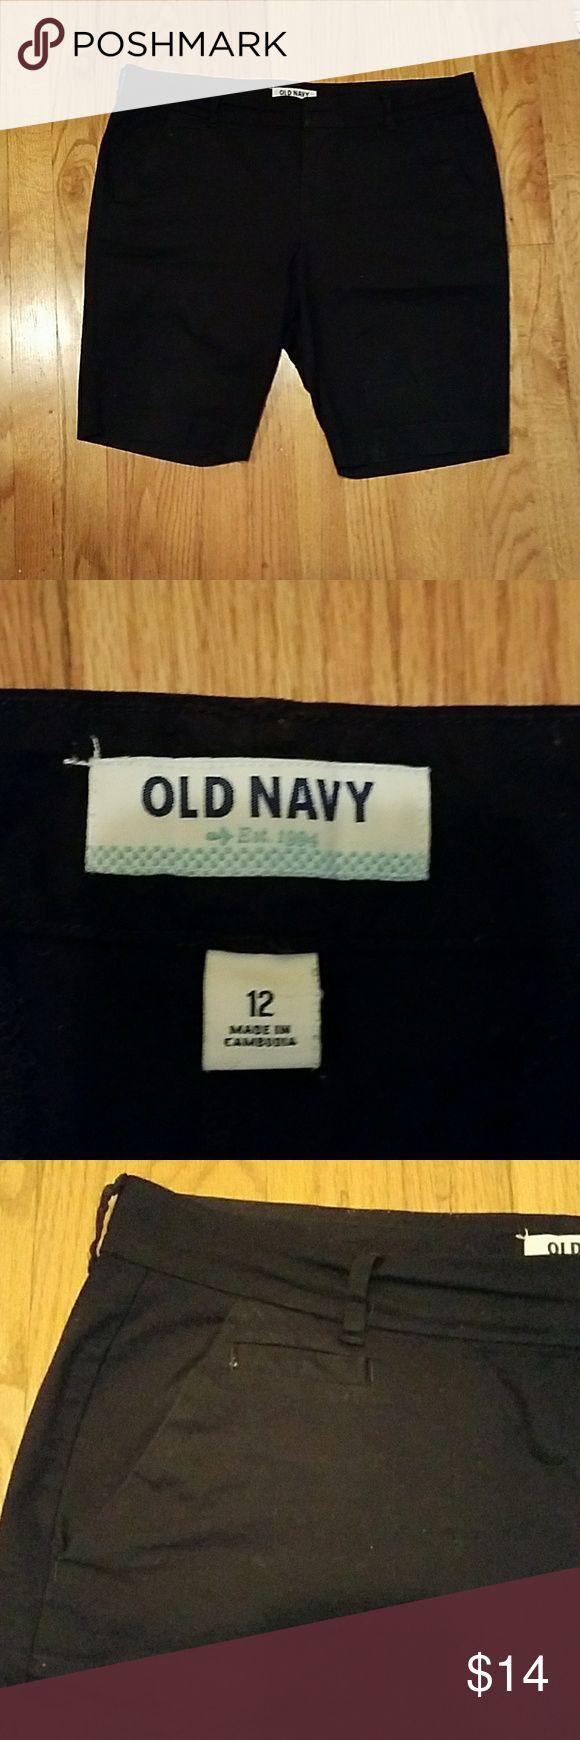 Bermuda shorts Old Navy Bermuda shorts, black, size 12 Old Navy Shorts Bermudas